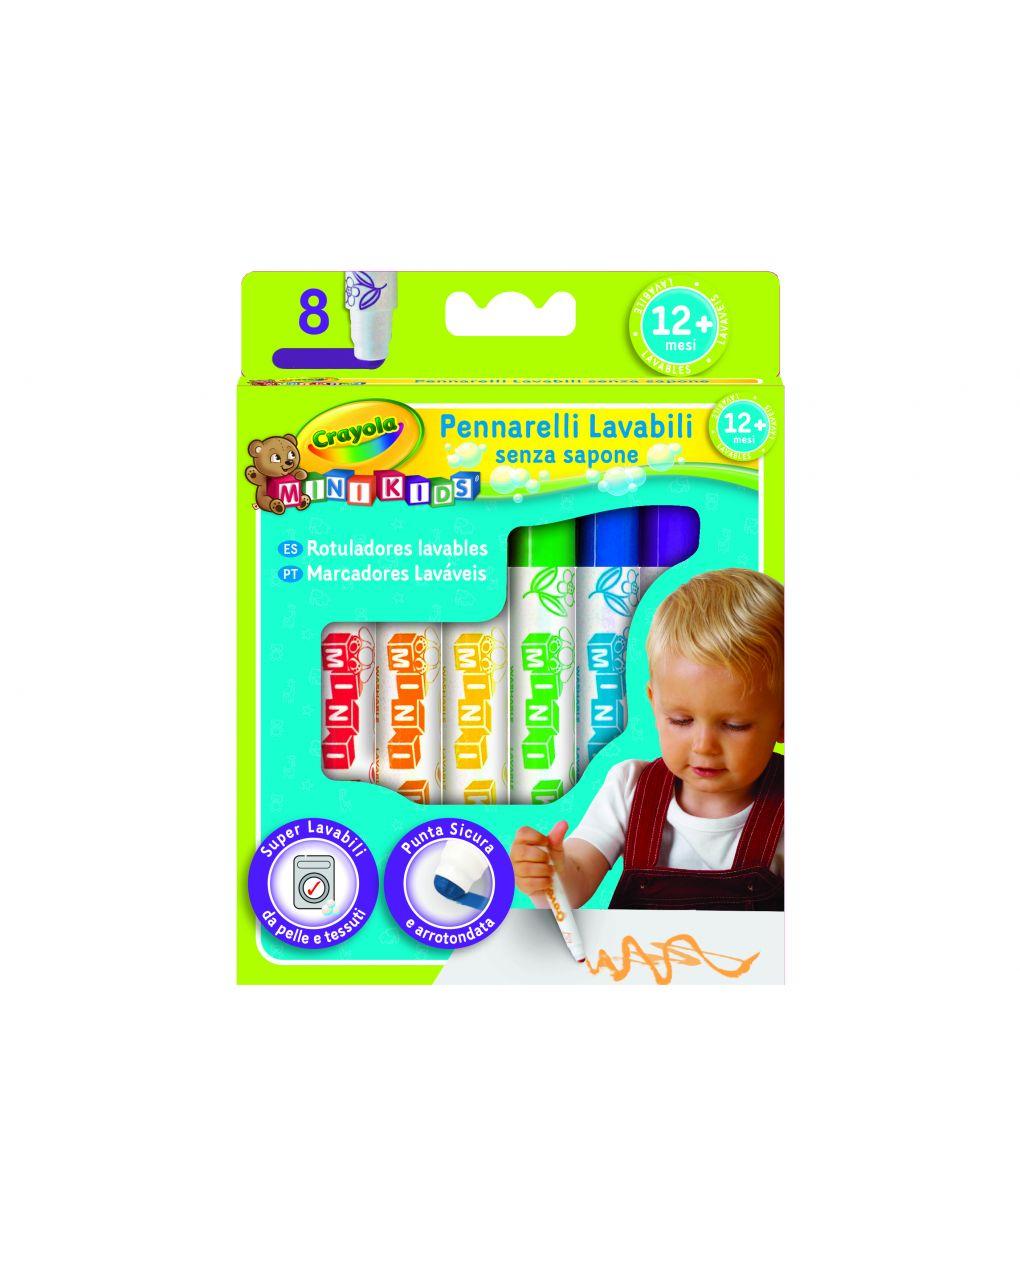 Crayola - 8 colori fibra mini kids - Crayola